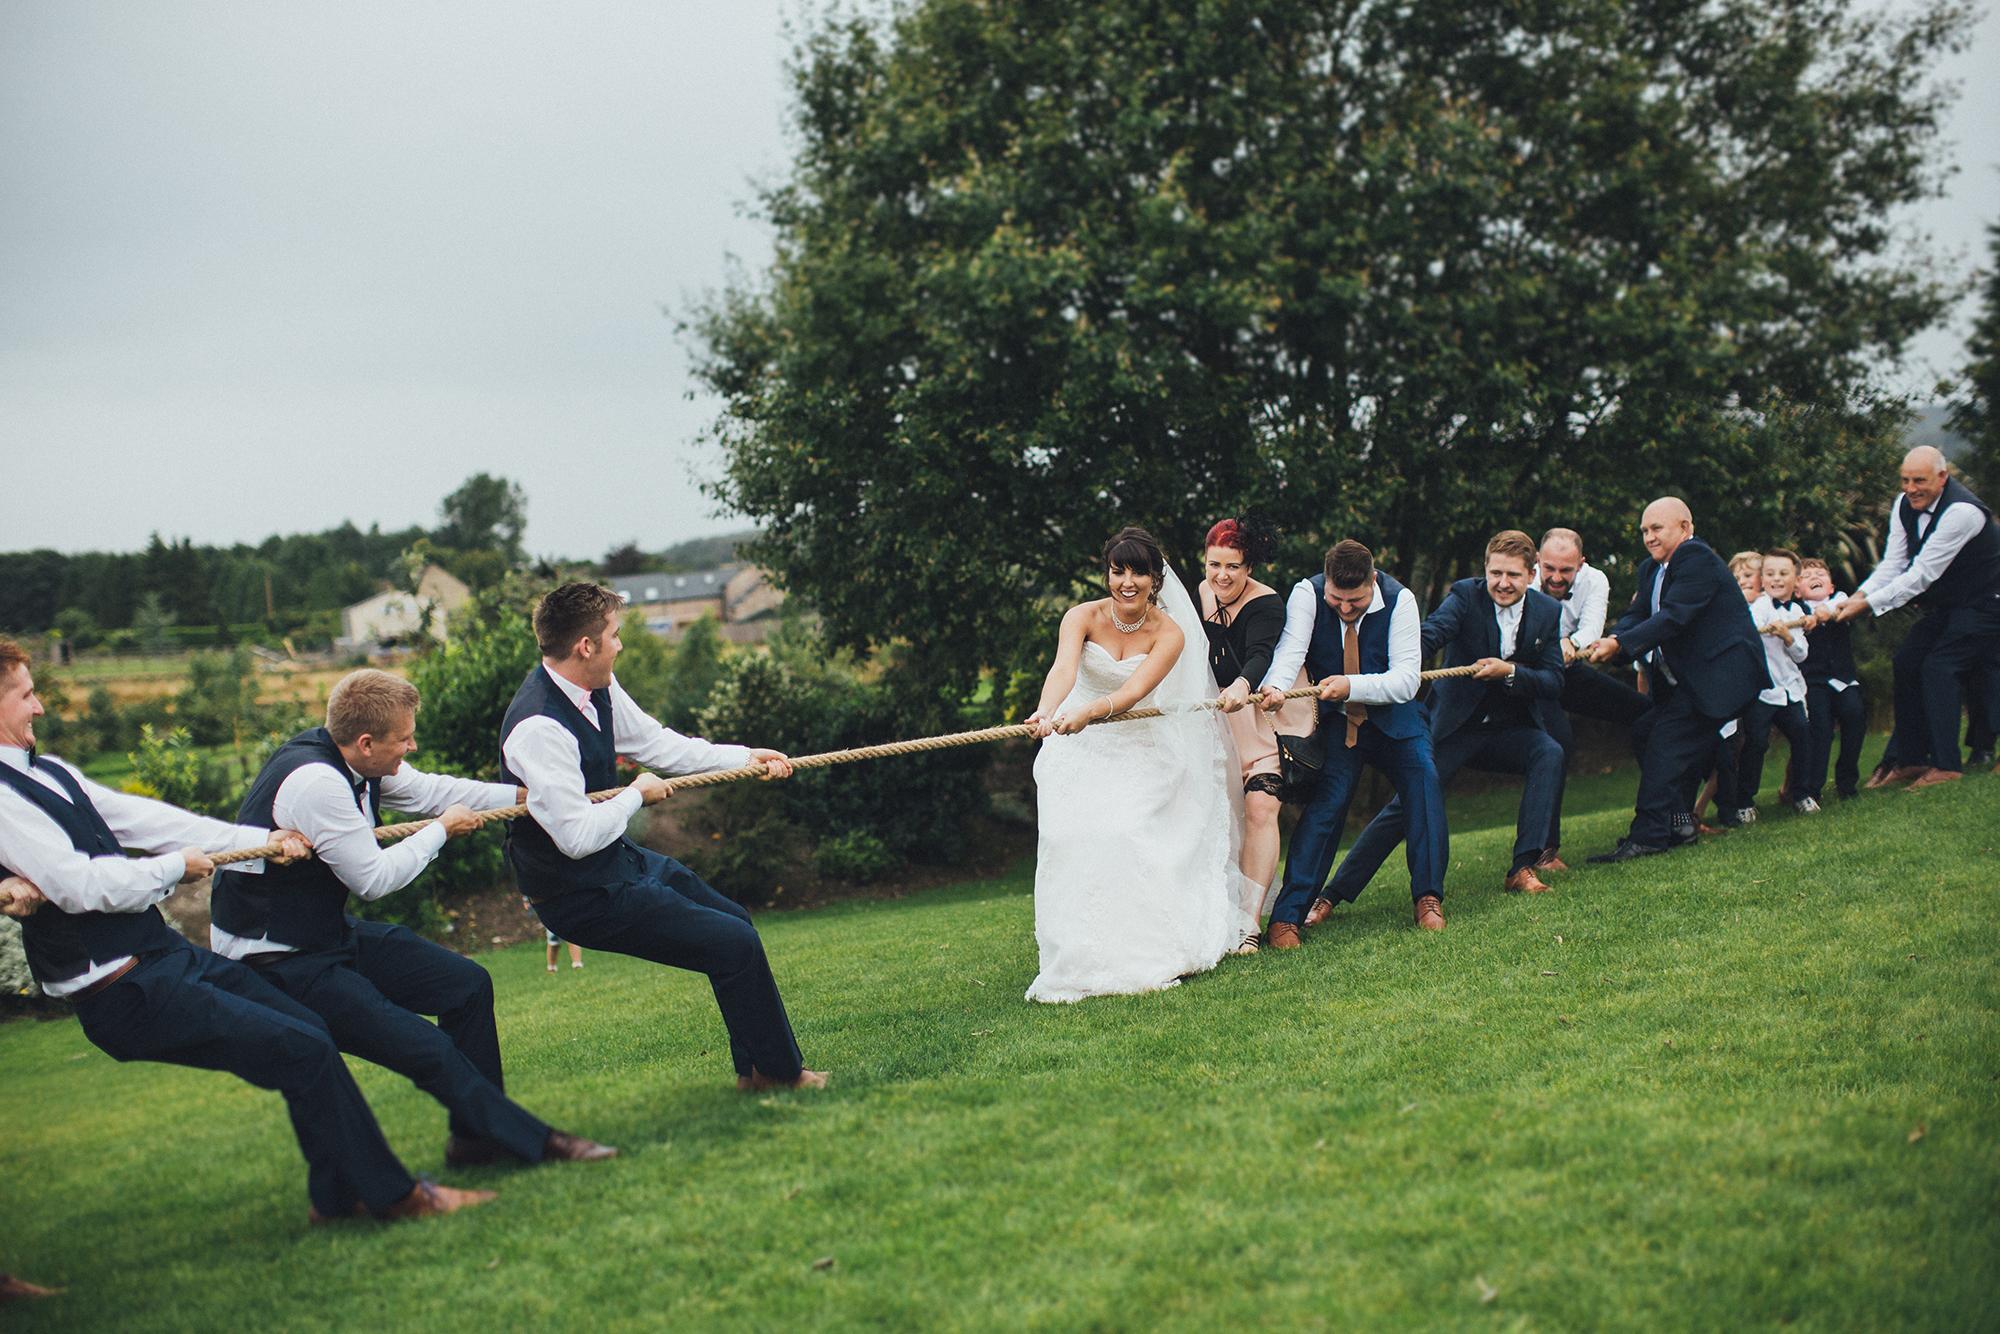 peak edge wedding photographers41.jpg